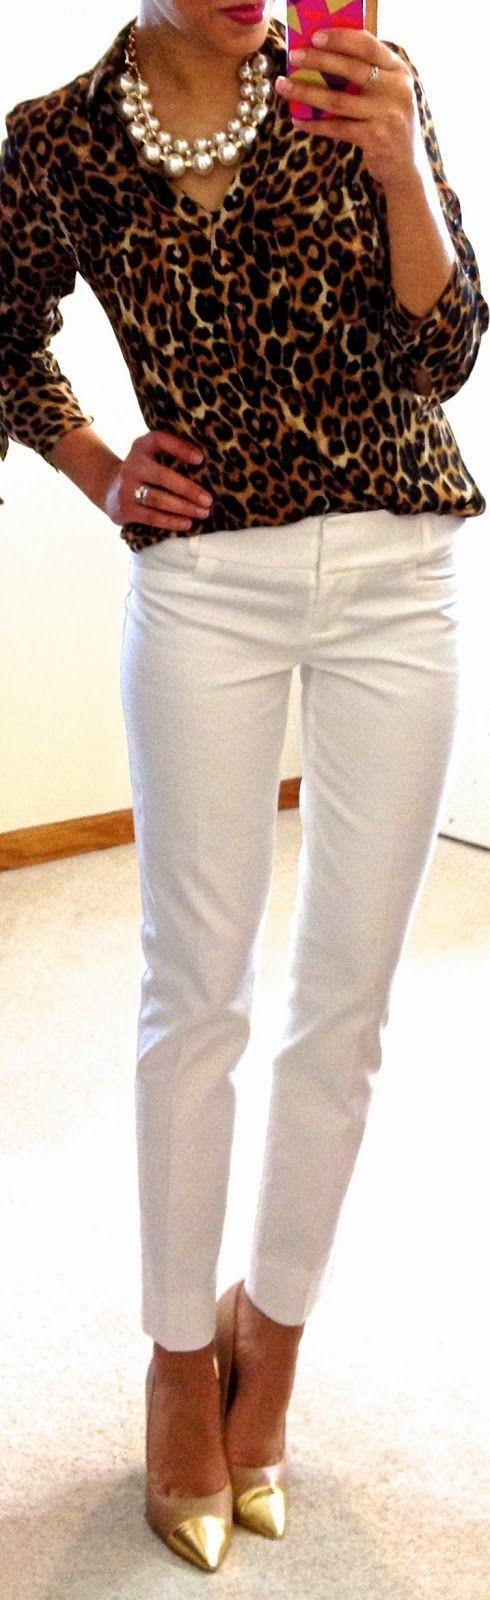 Animal print blouse with basic white pants